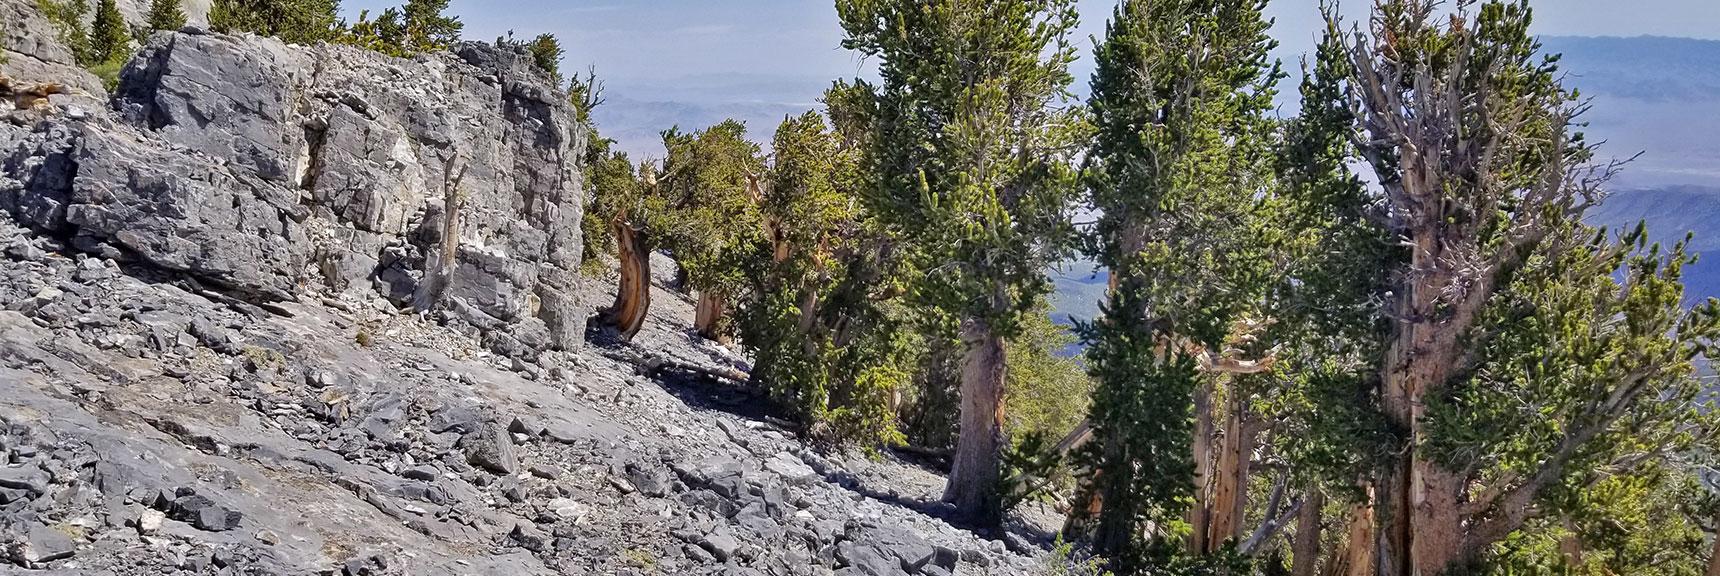 Mummy Mountain's Knees | Mt Charleston Wilderness | Spring Mountains, Nevada